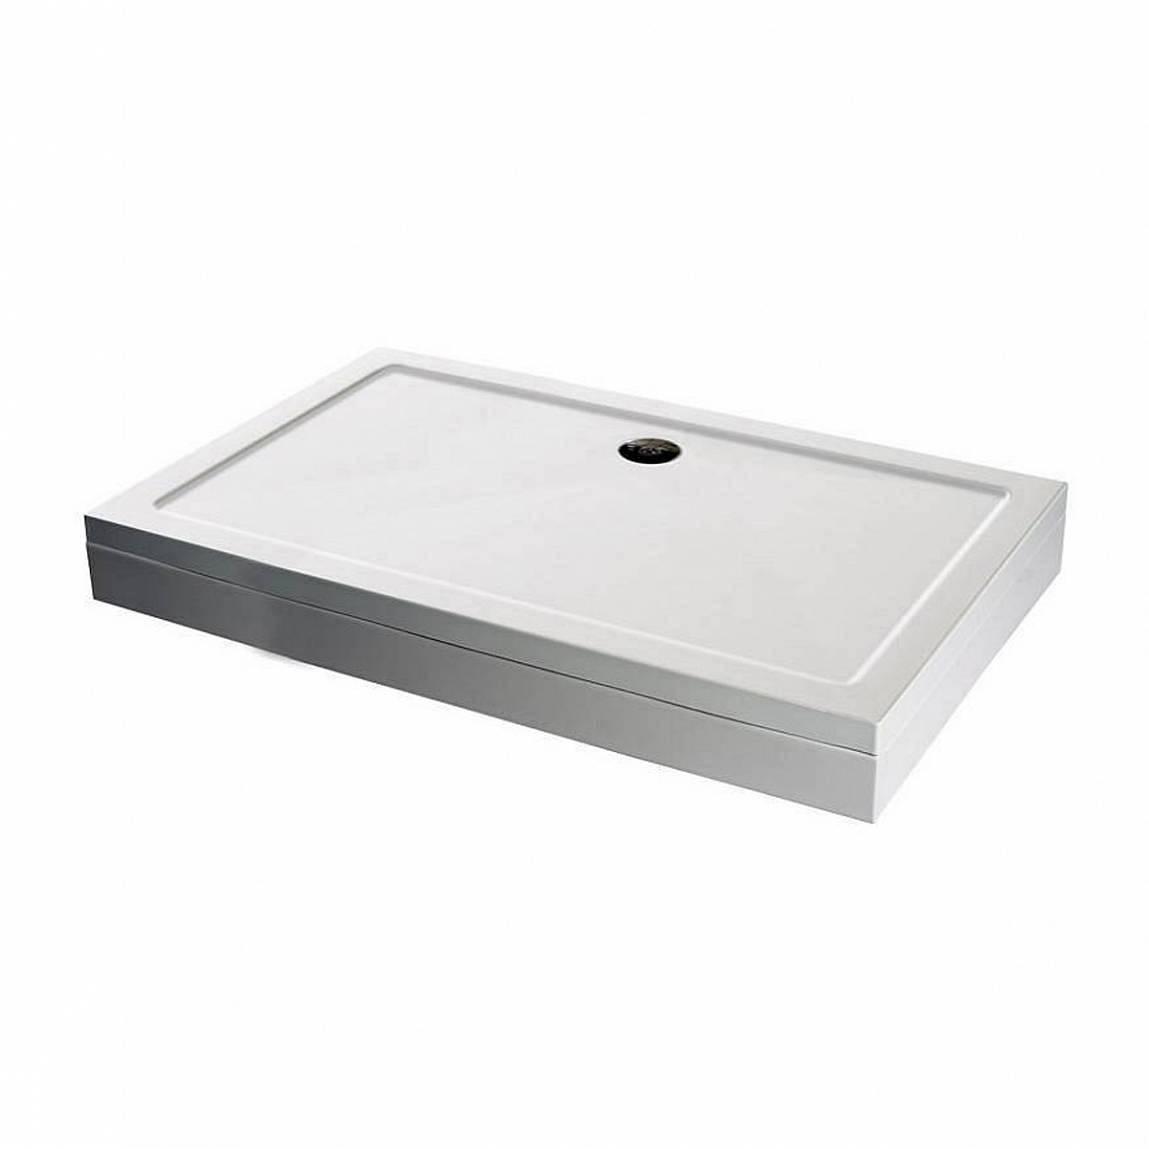 Image of Rectangular Stone Shower Tray & Riser Kit 1400 x 800